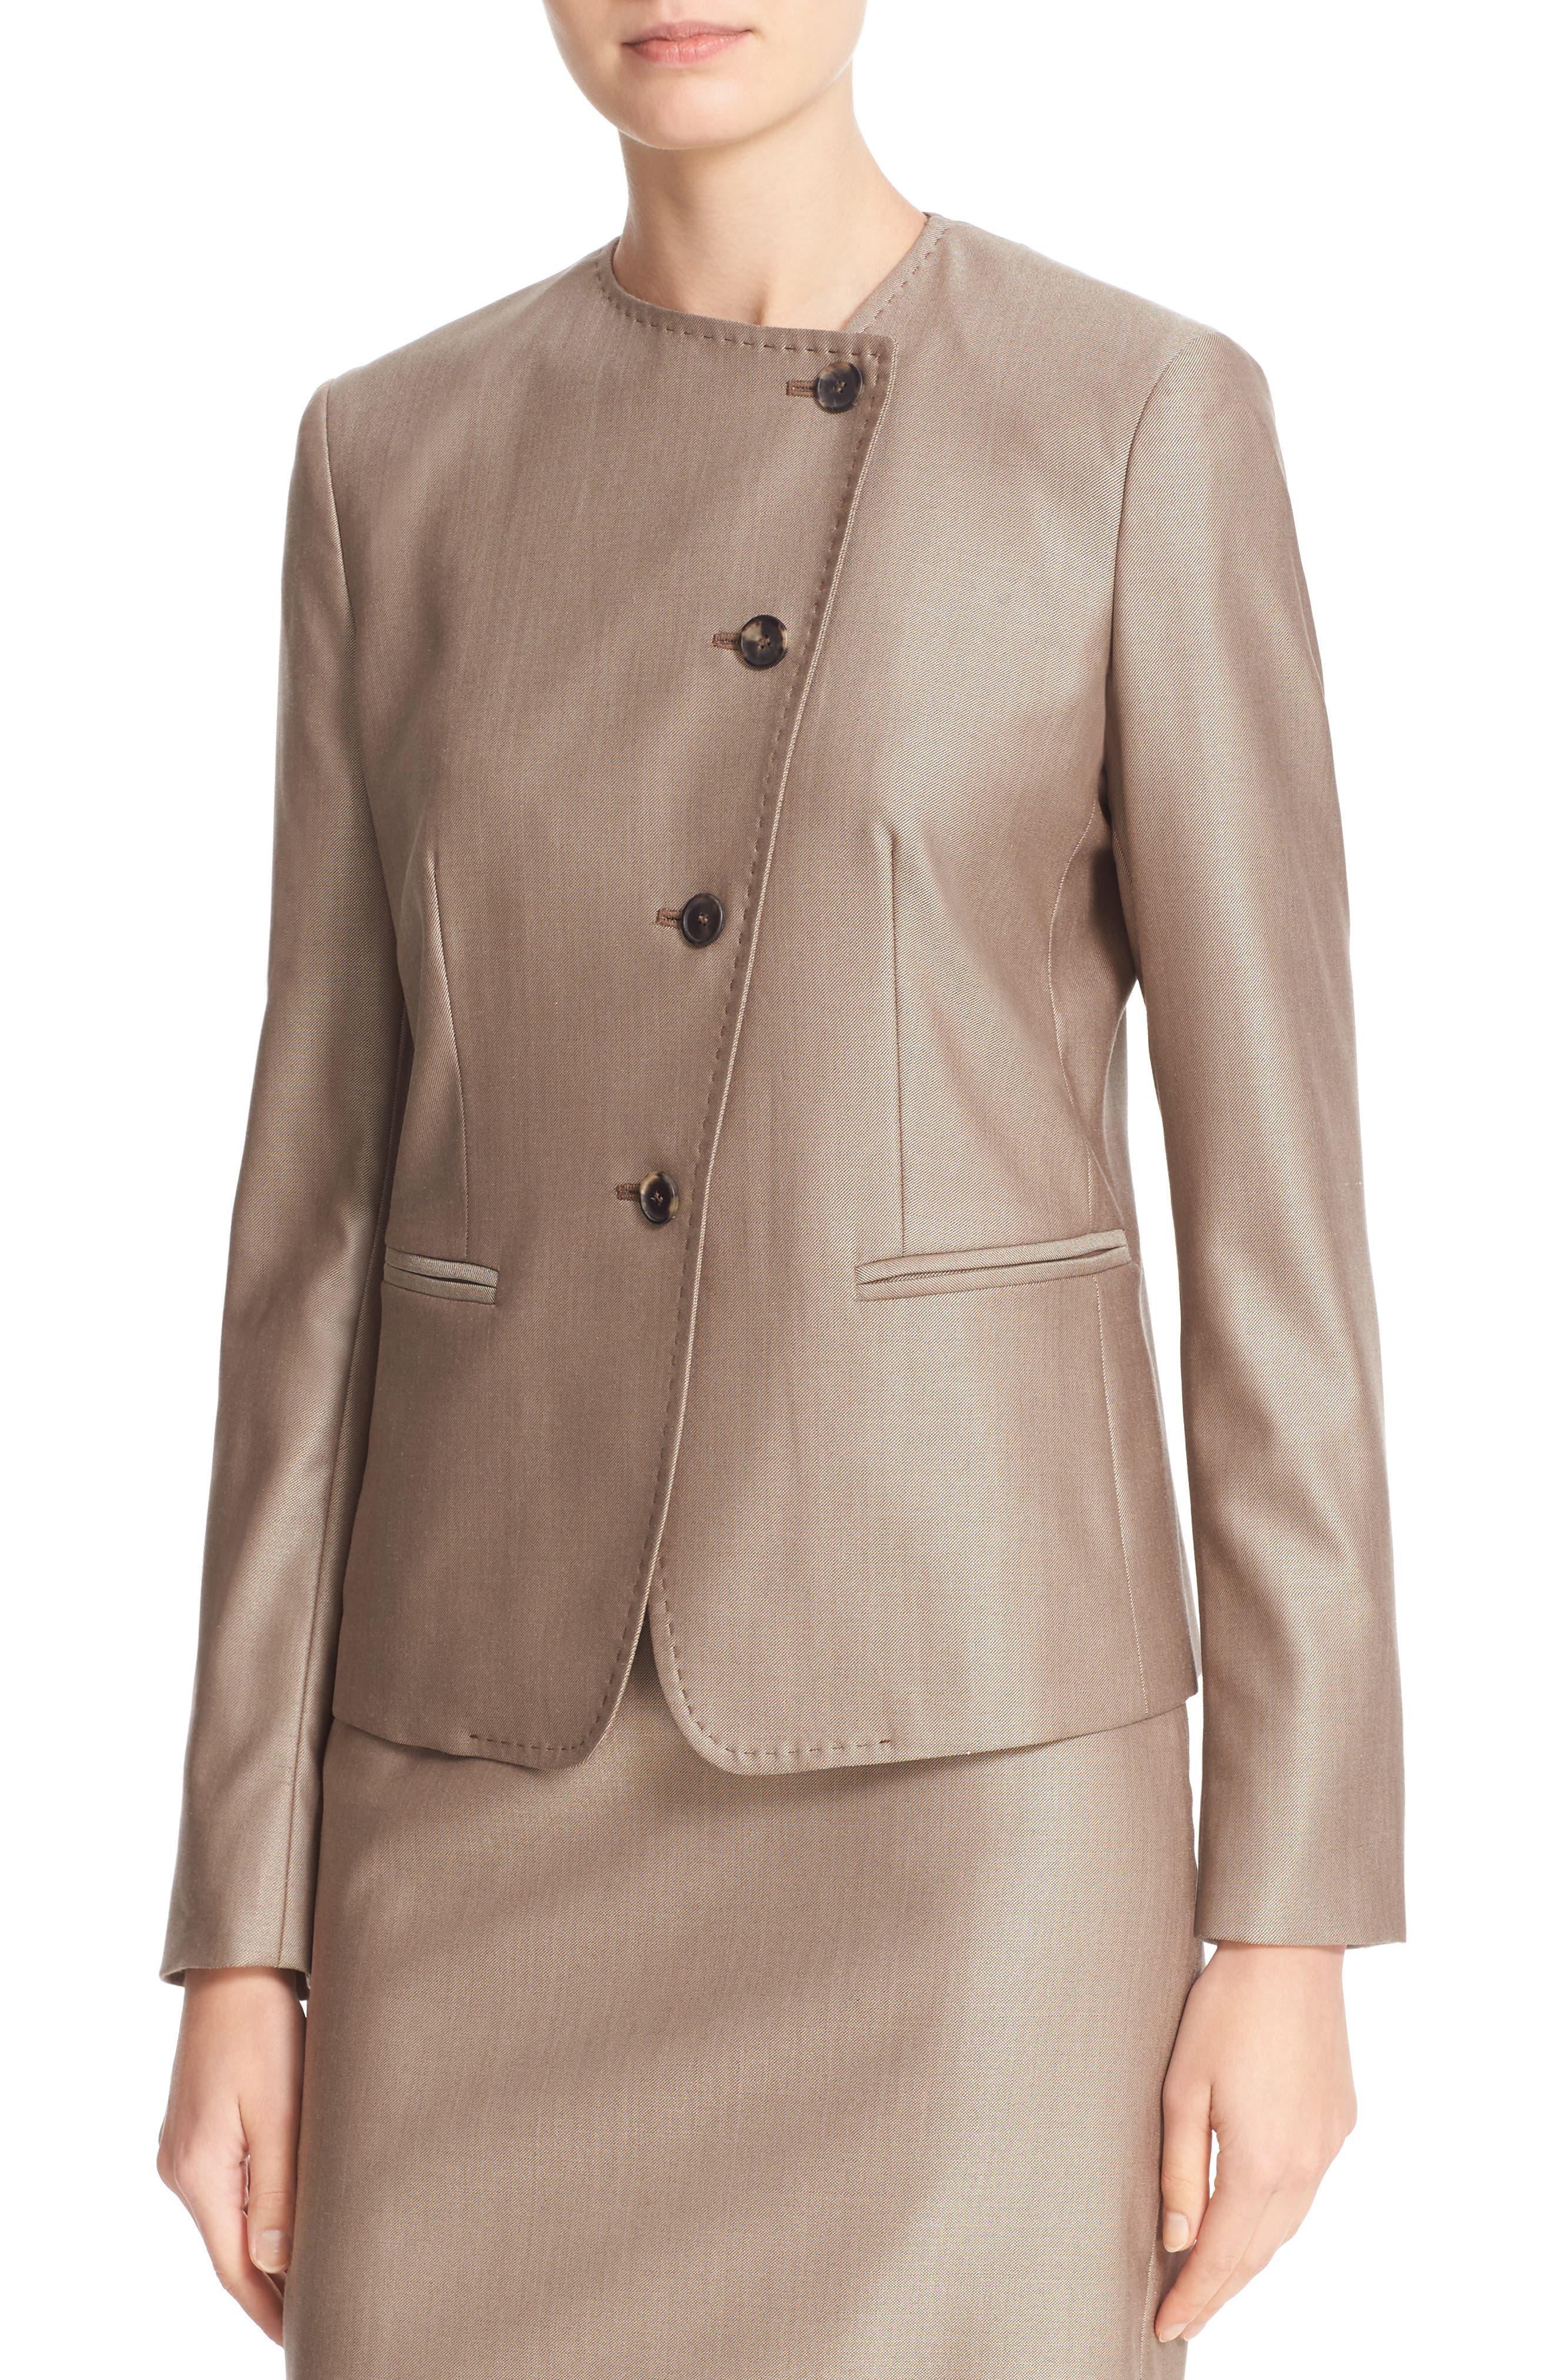 Erba Asymmetrical Jacket,                             Alternate thumbnail 5, color,                             220